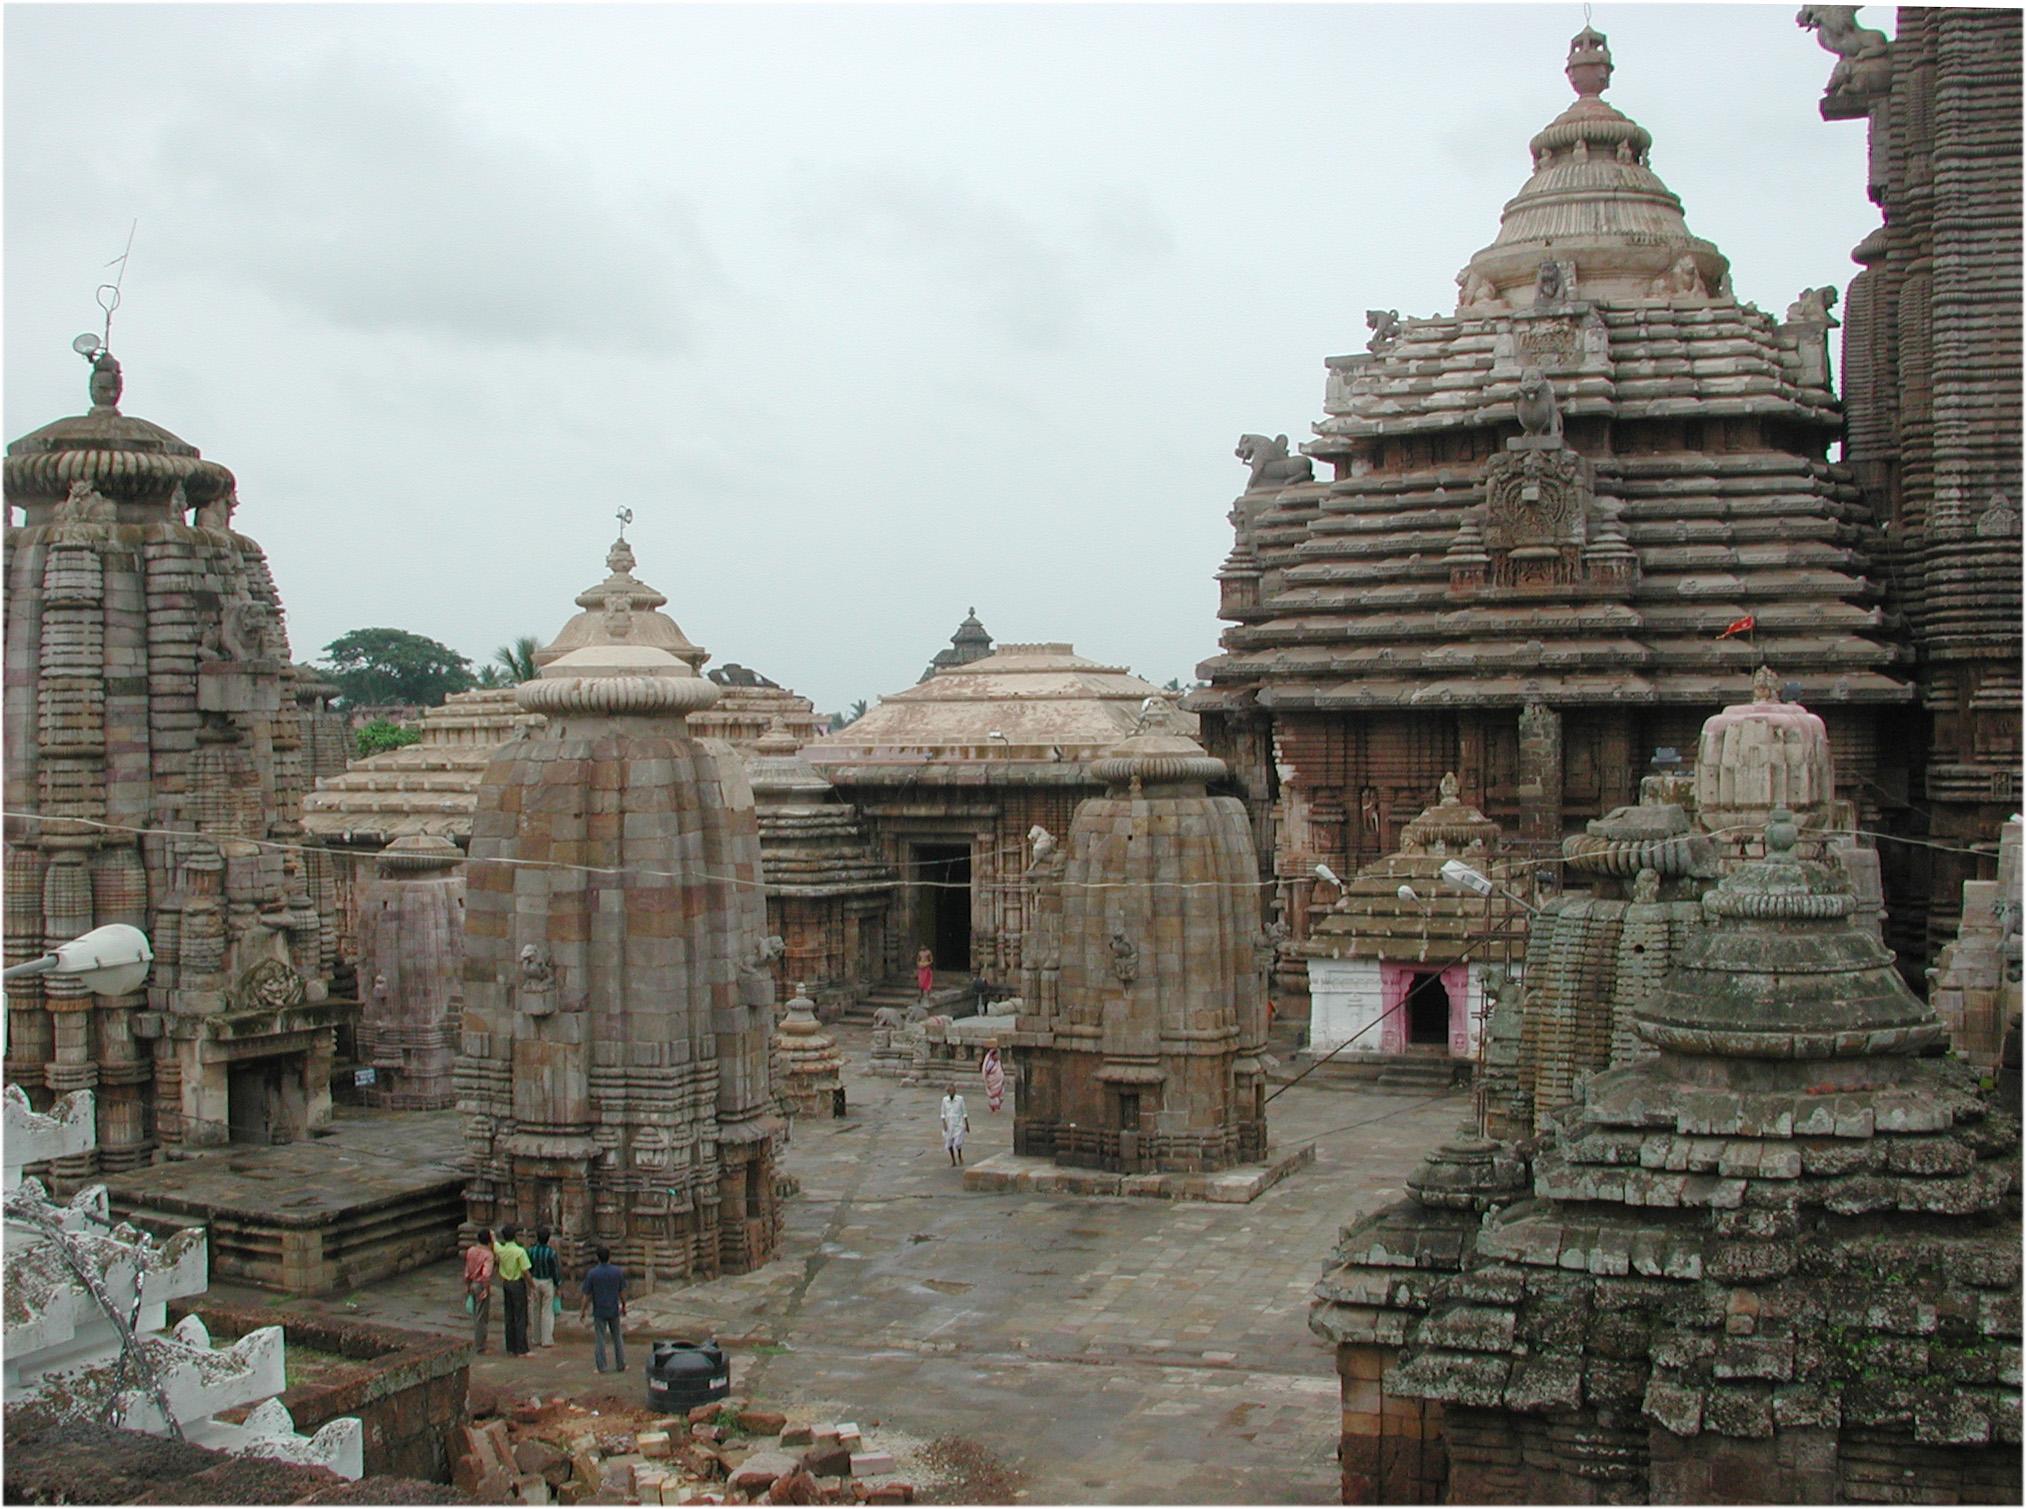 Lingaraj_temple_Bhubaneswar_11005